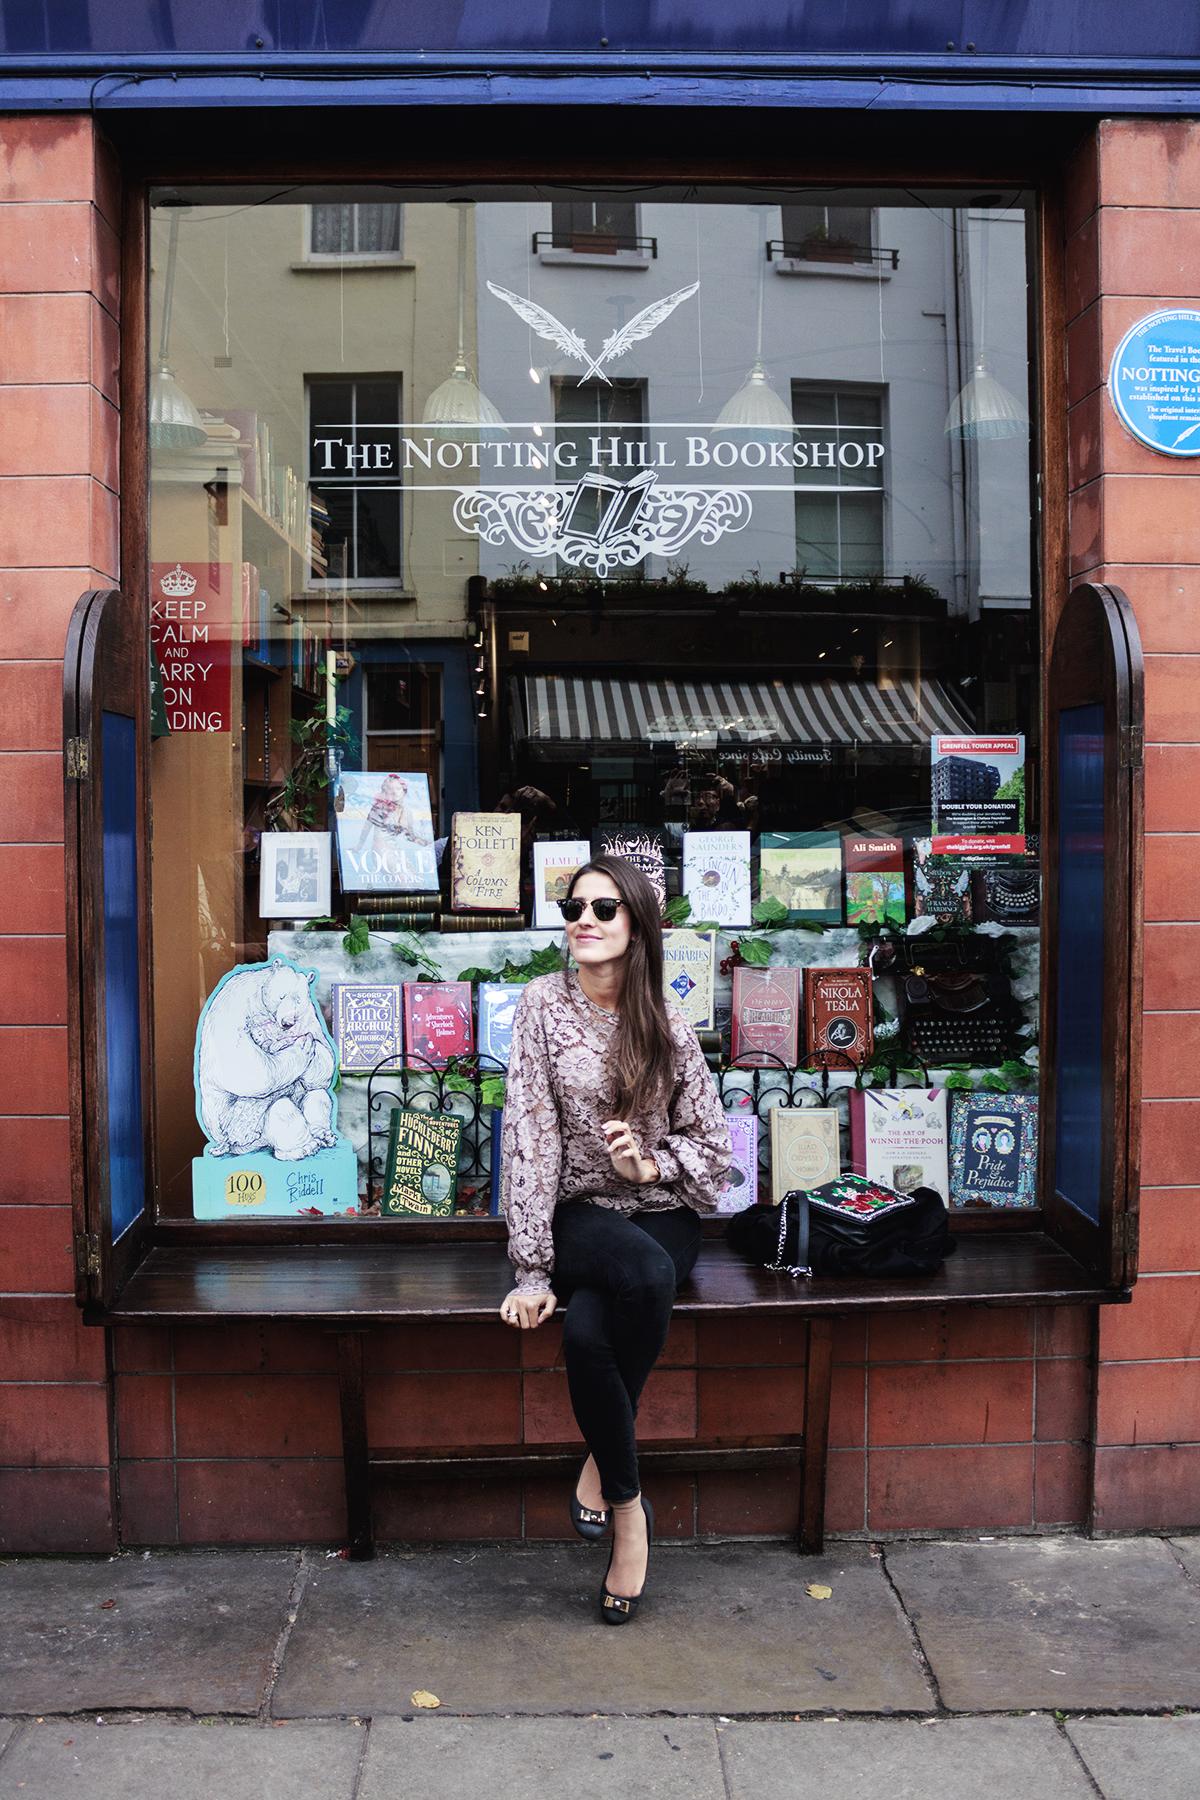 Notting Hill libreria pelicula londres